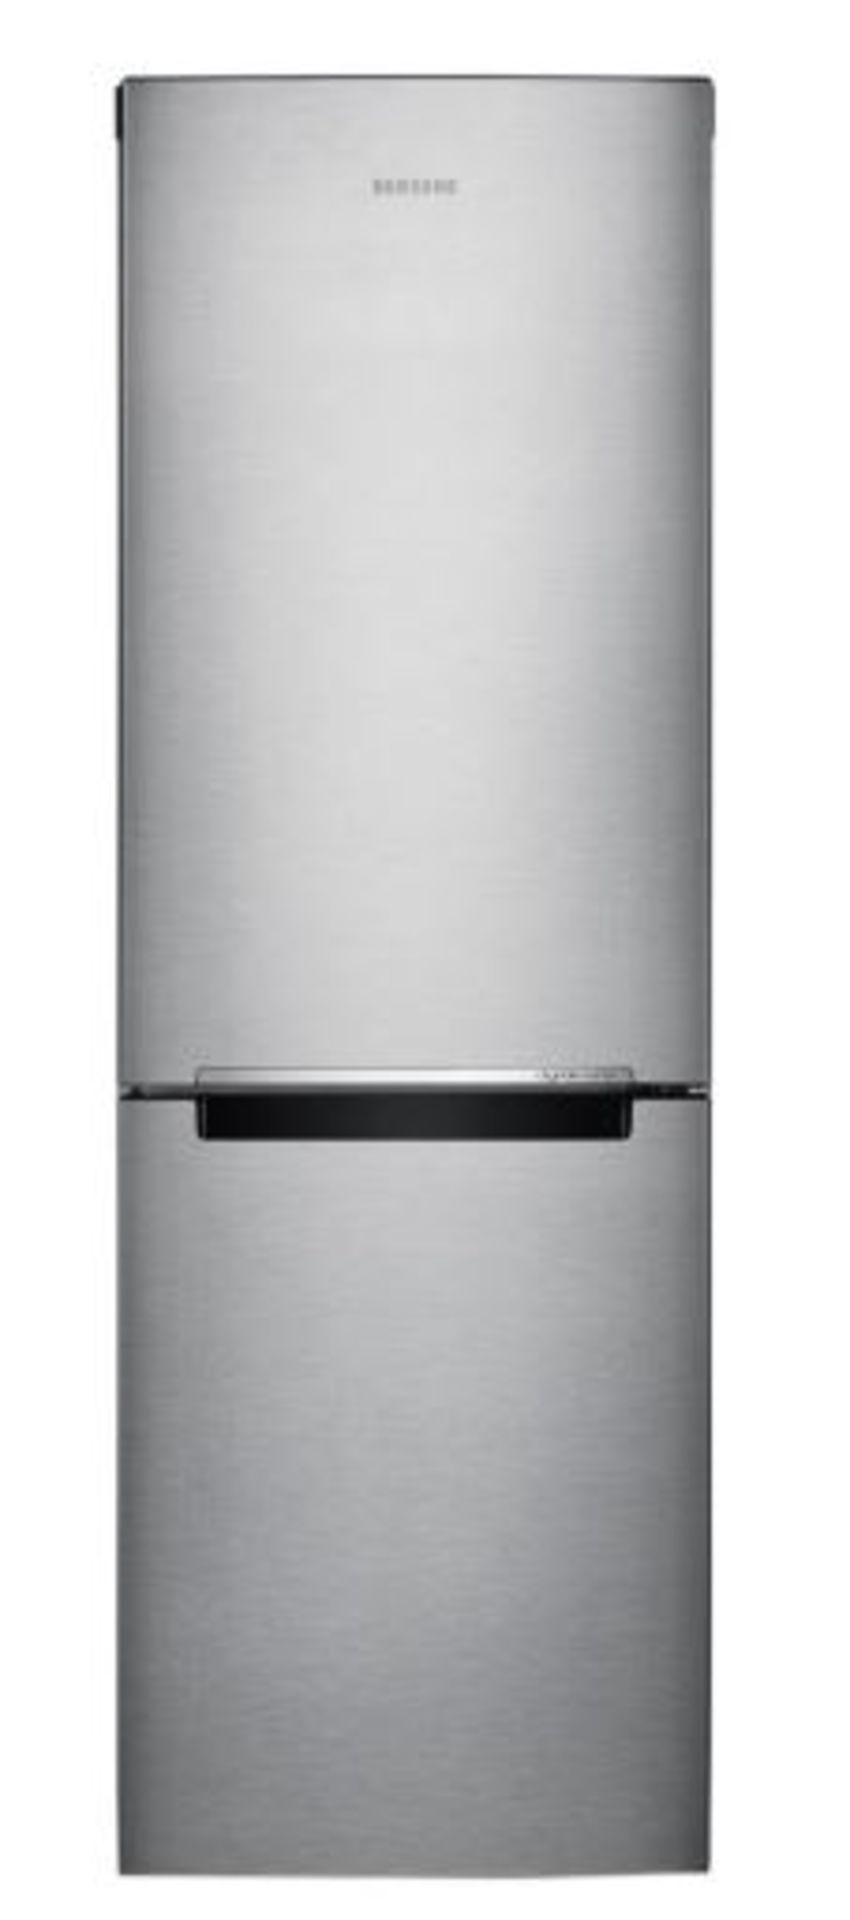 Pallet of 1 Samsung 60CM Fridge Freezer. Latest selling price £399